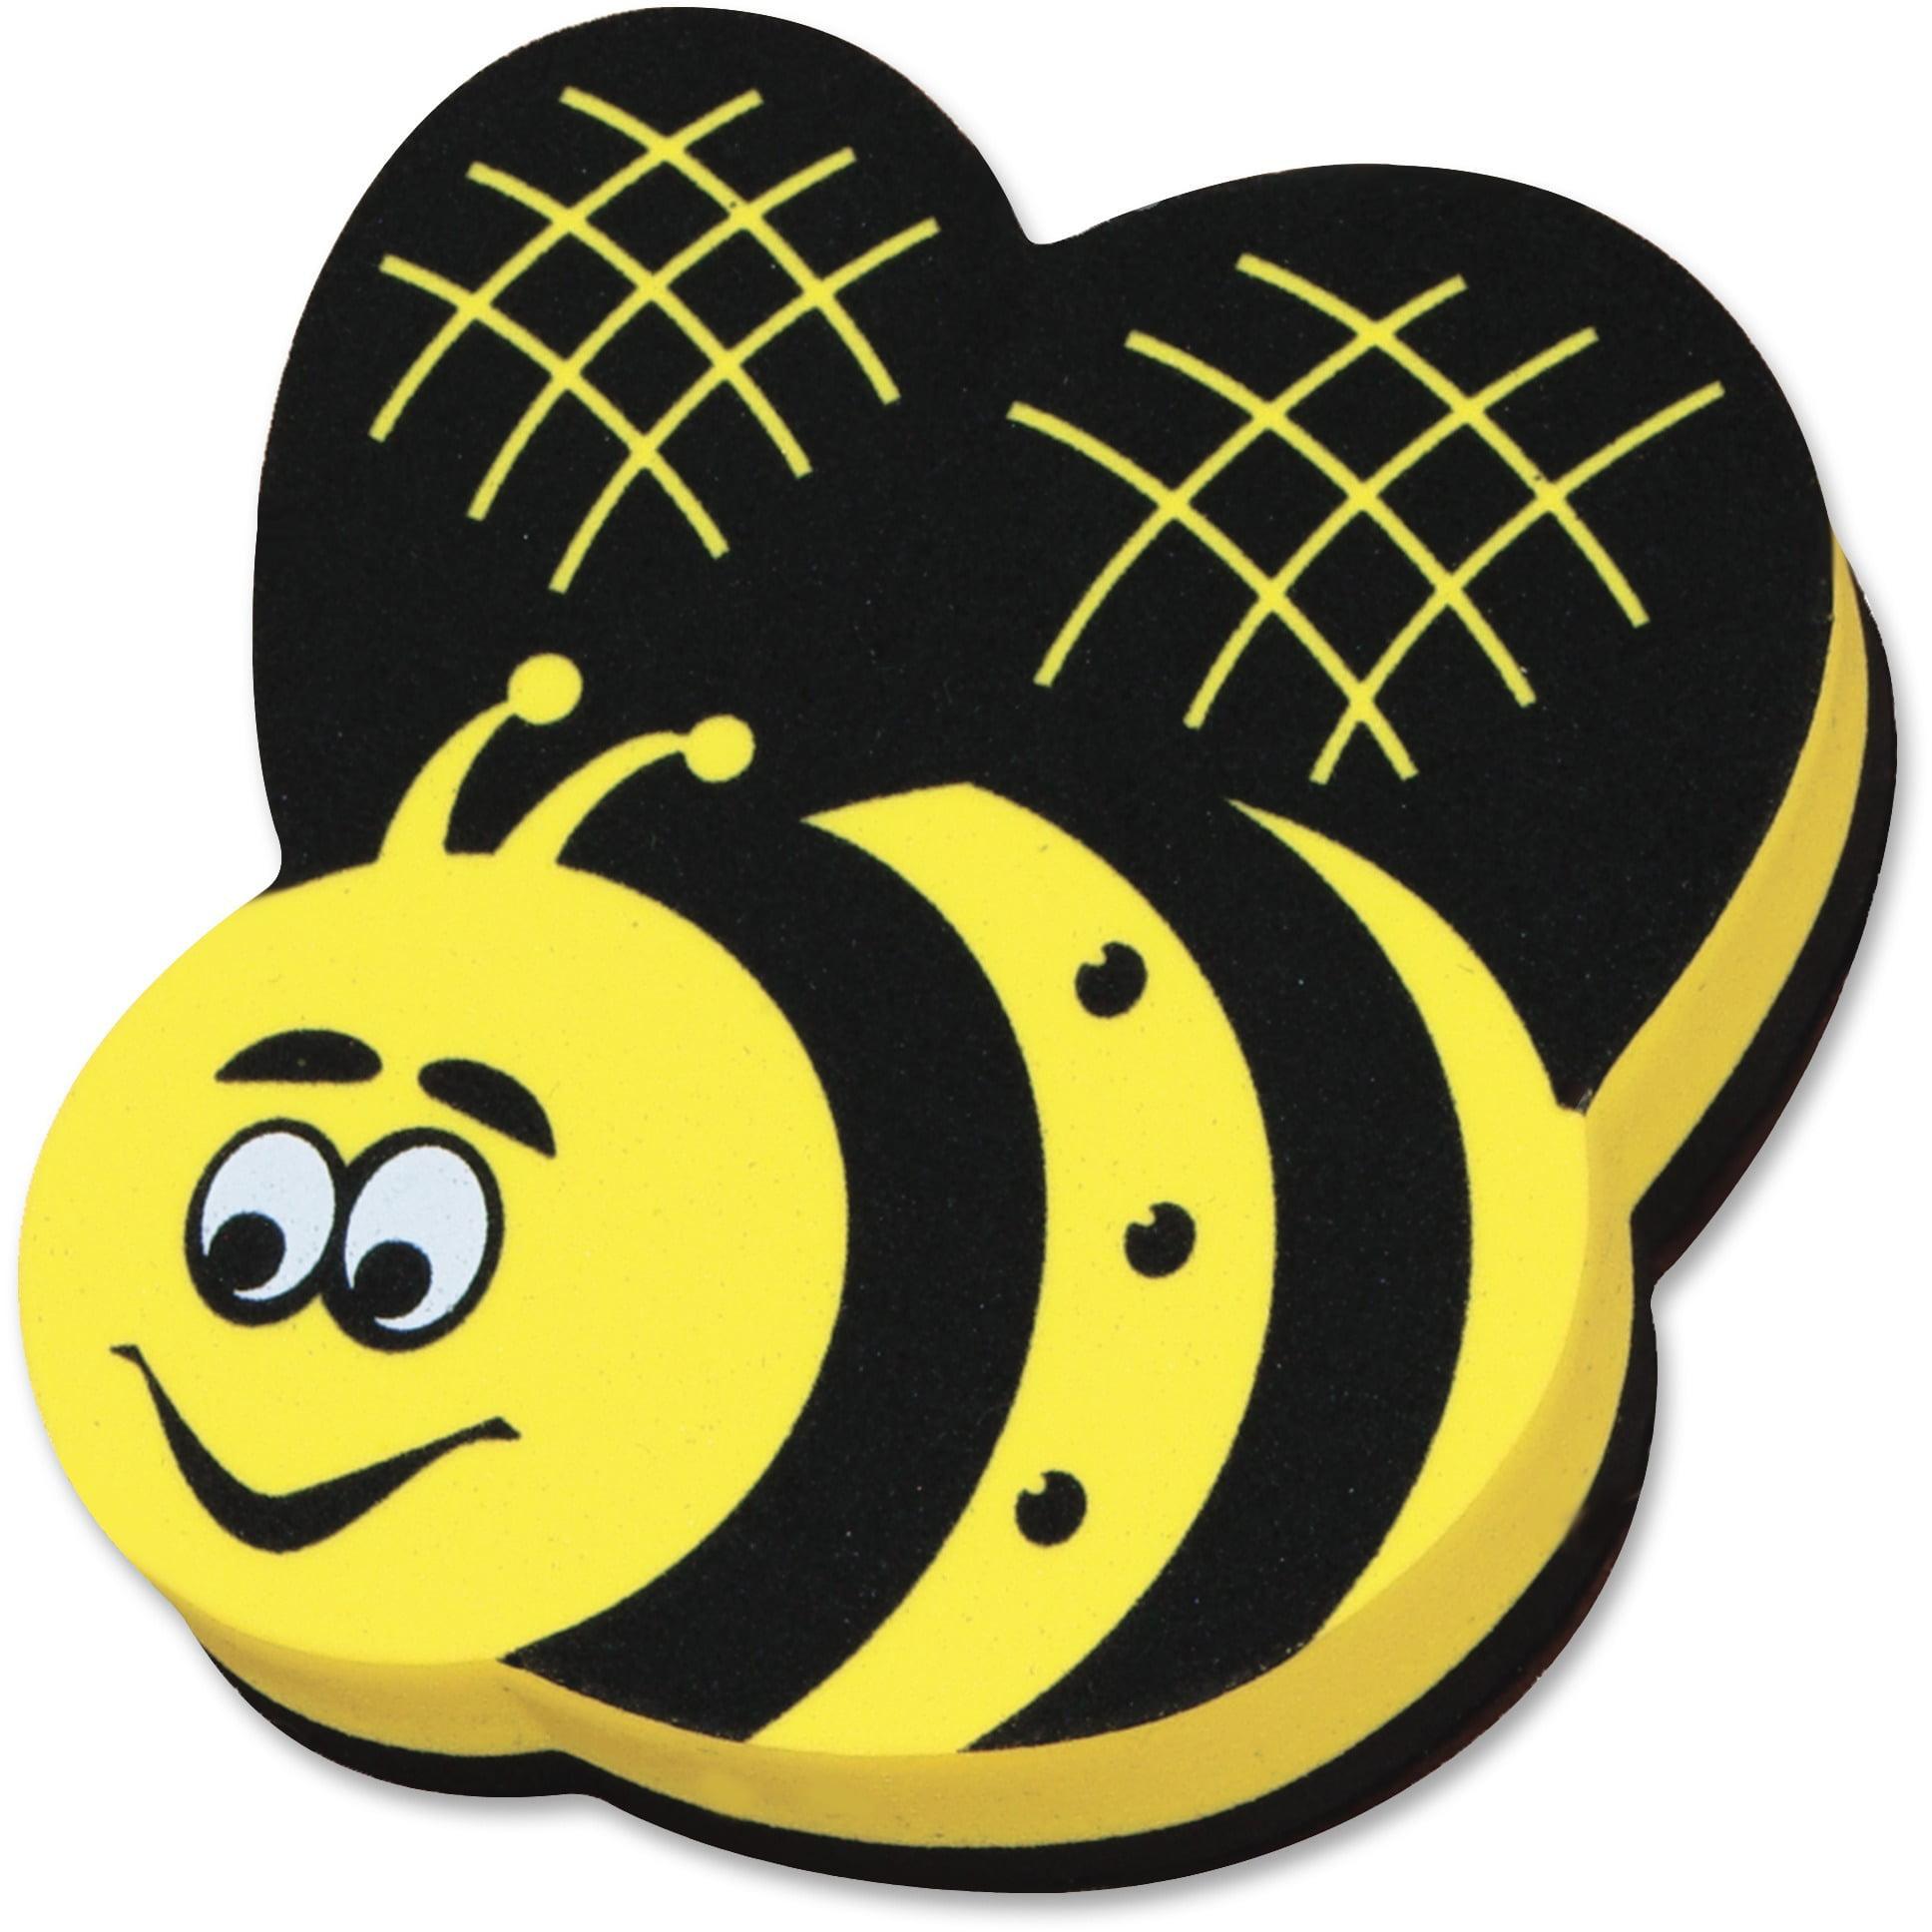 Ashley, ASH10019, Bee Design Magnetic Whiteboard Eraser, 1 Each, Yellow,Black